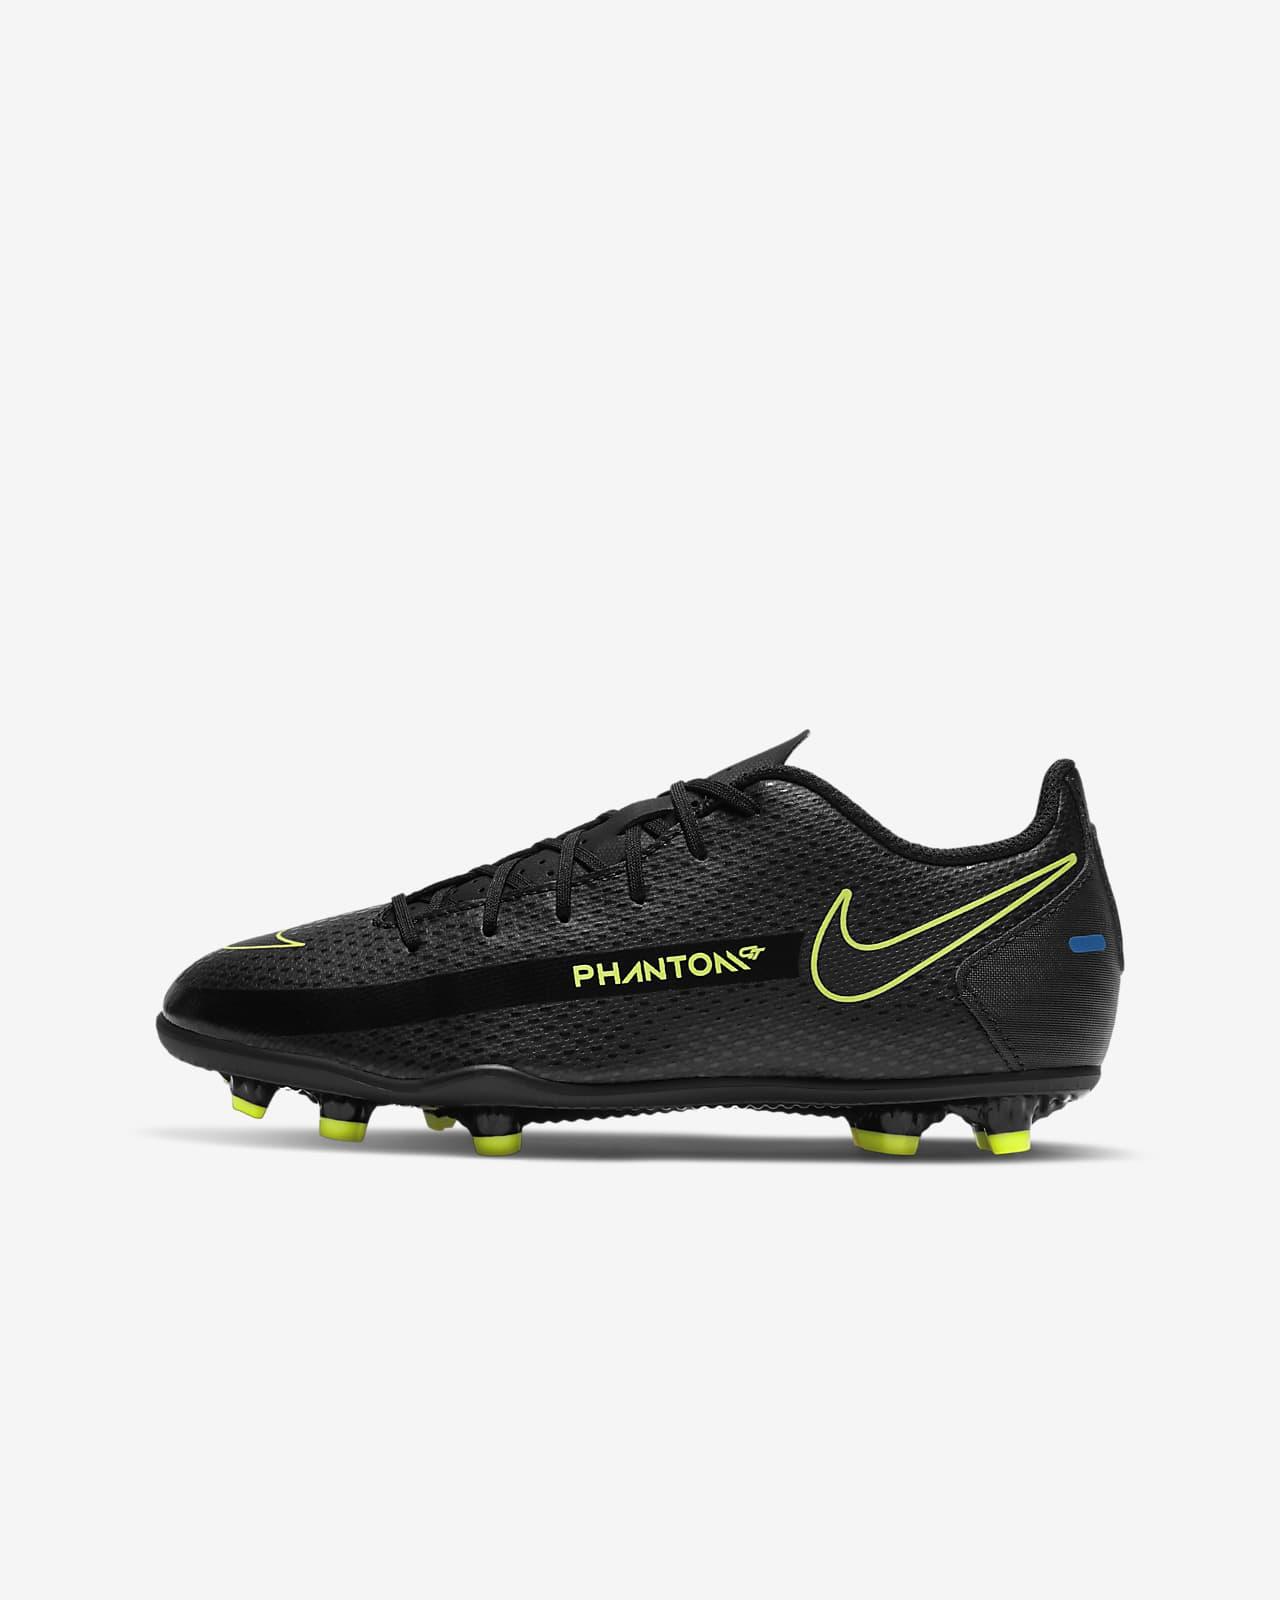 Calzado de fútbol para múltiples superficies para niños talla pequeña/grande Nike Jr. Phantom GT Club MG